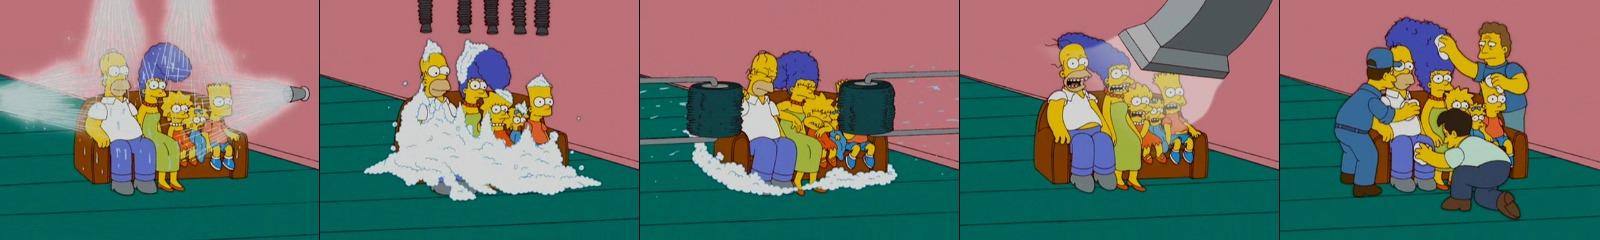 Моечная машина Симпсоны